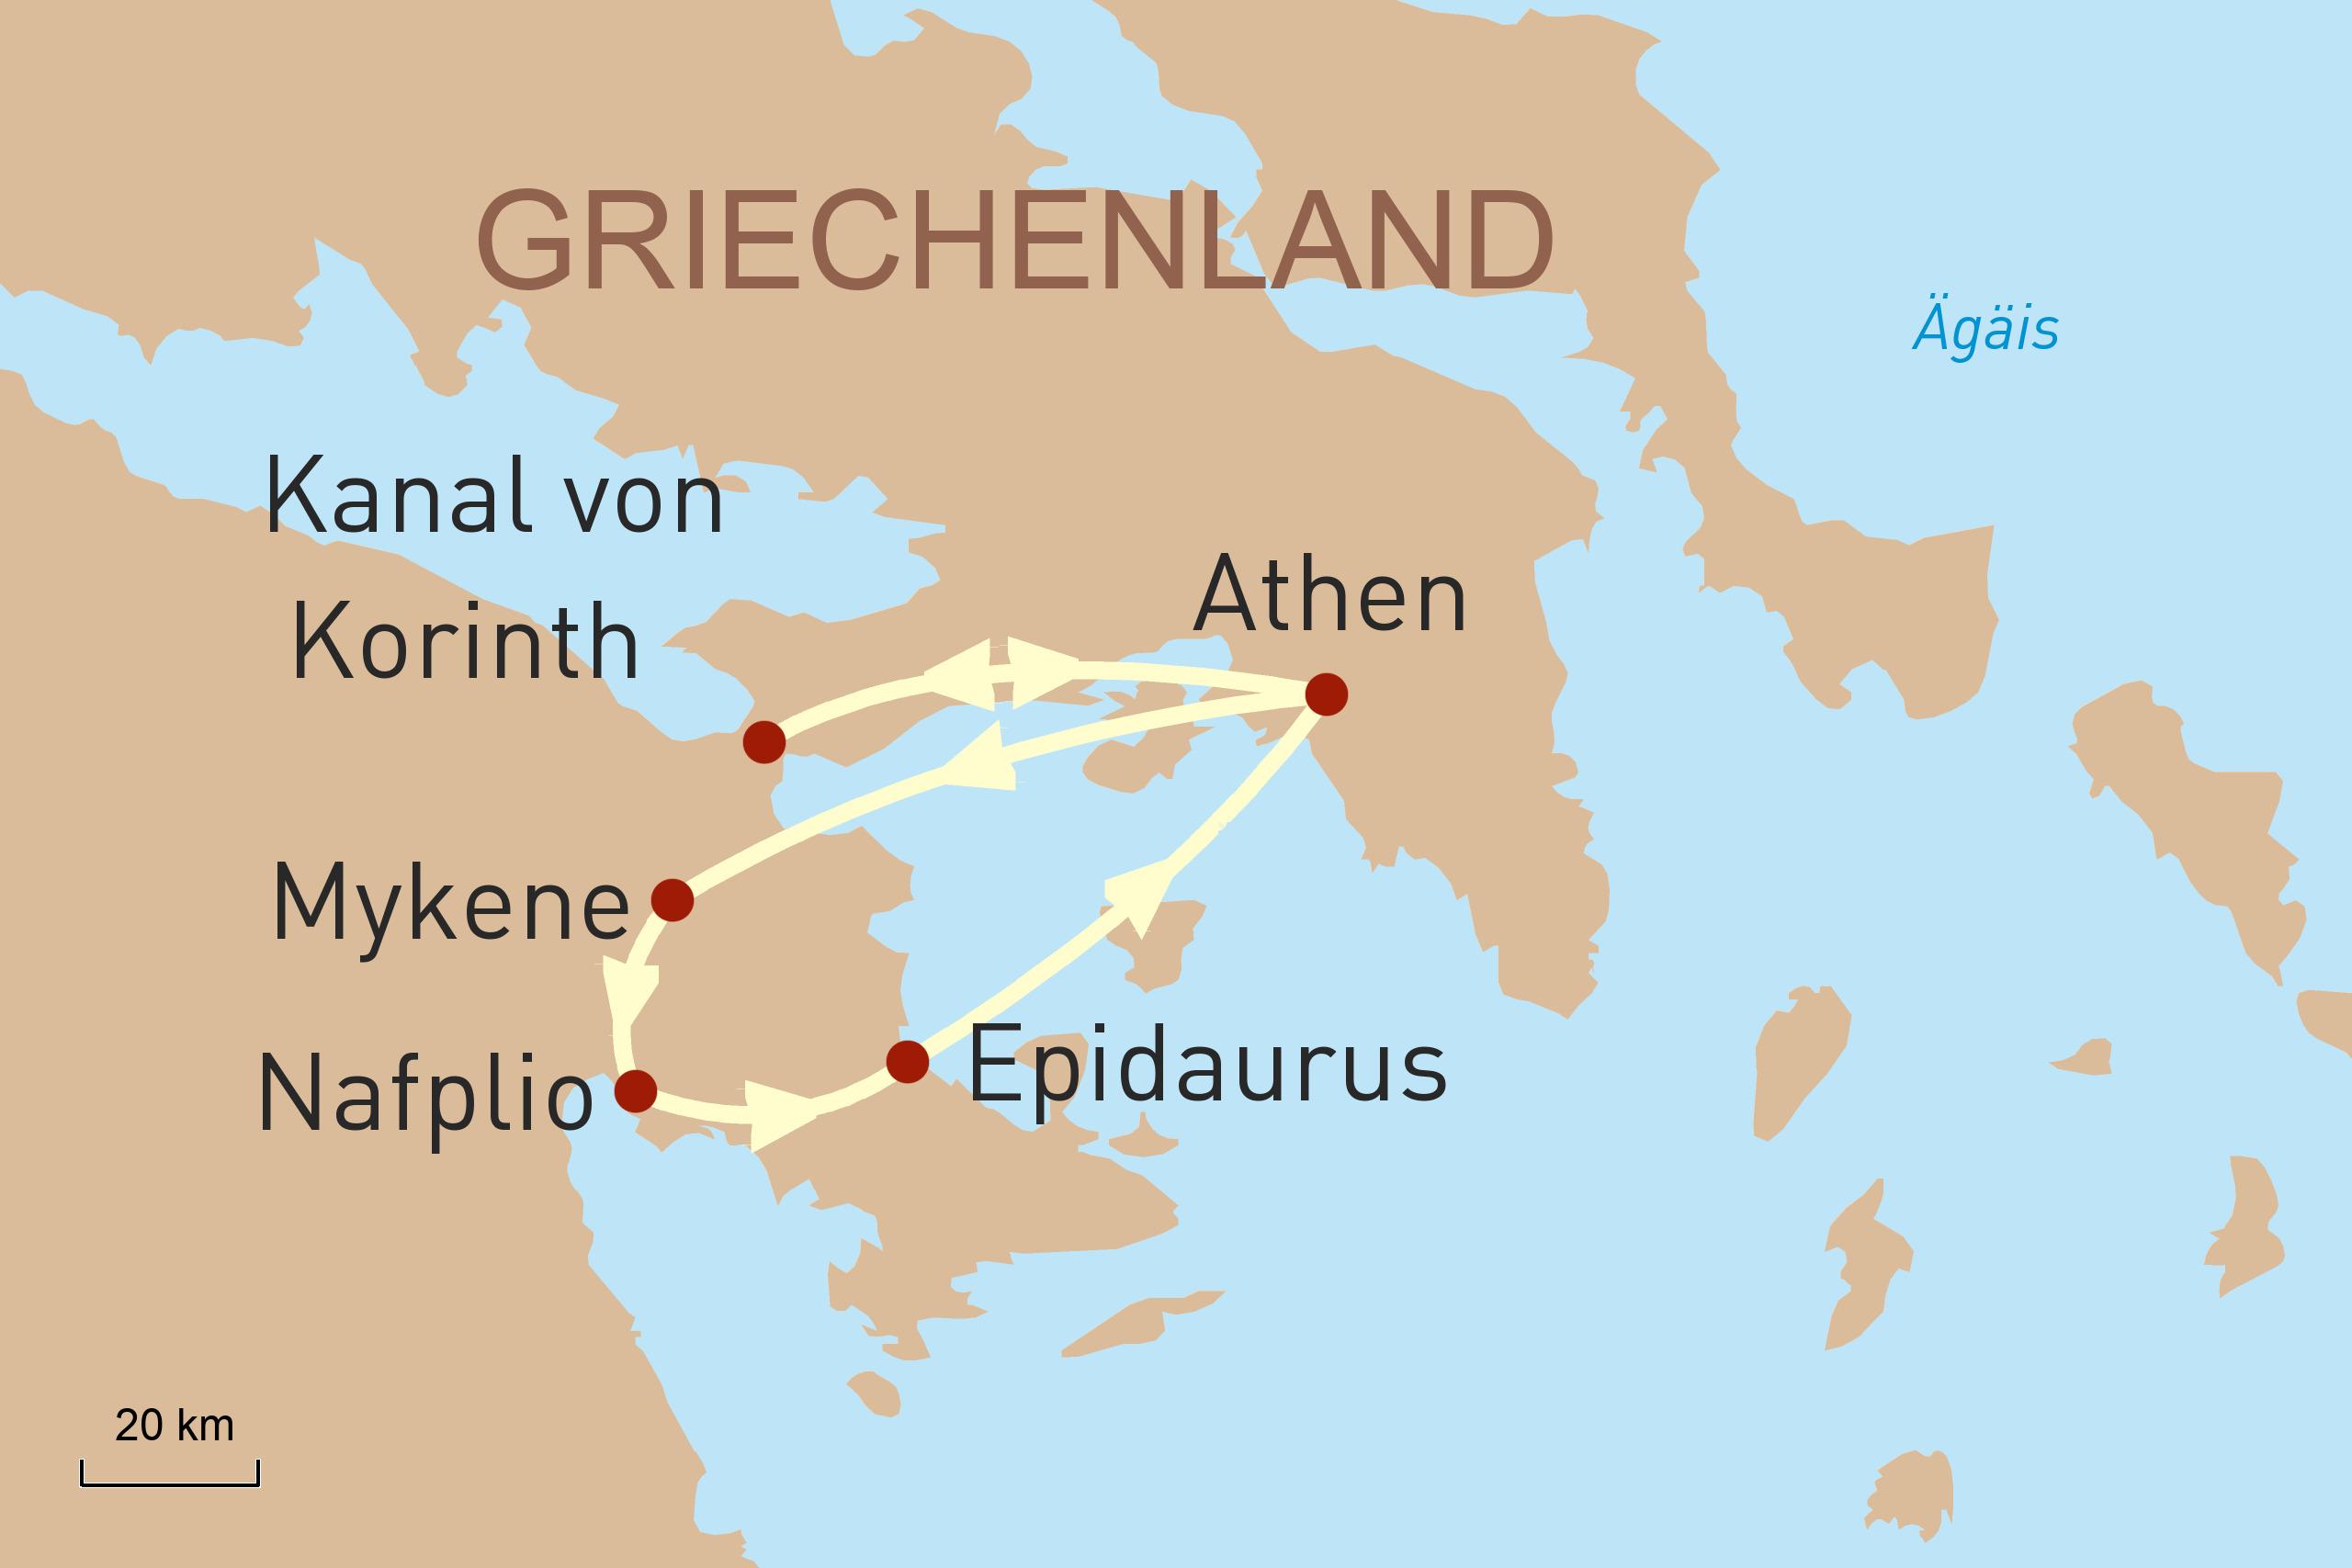 Drei perfekte Tage in Athen